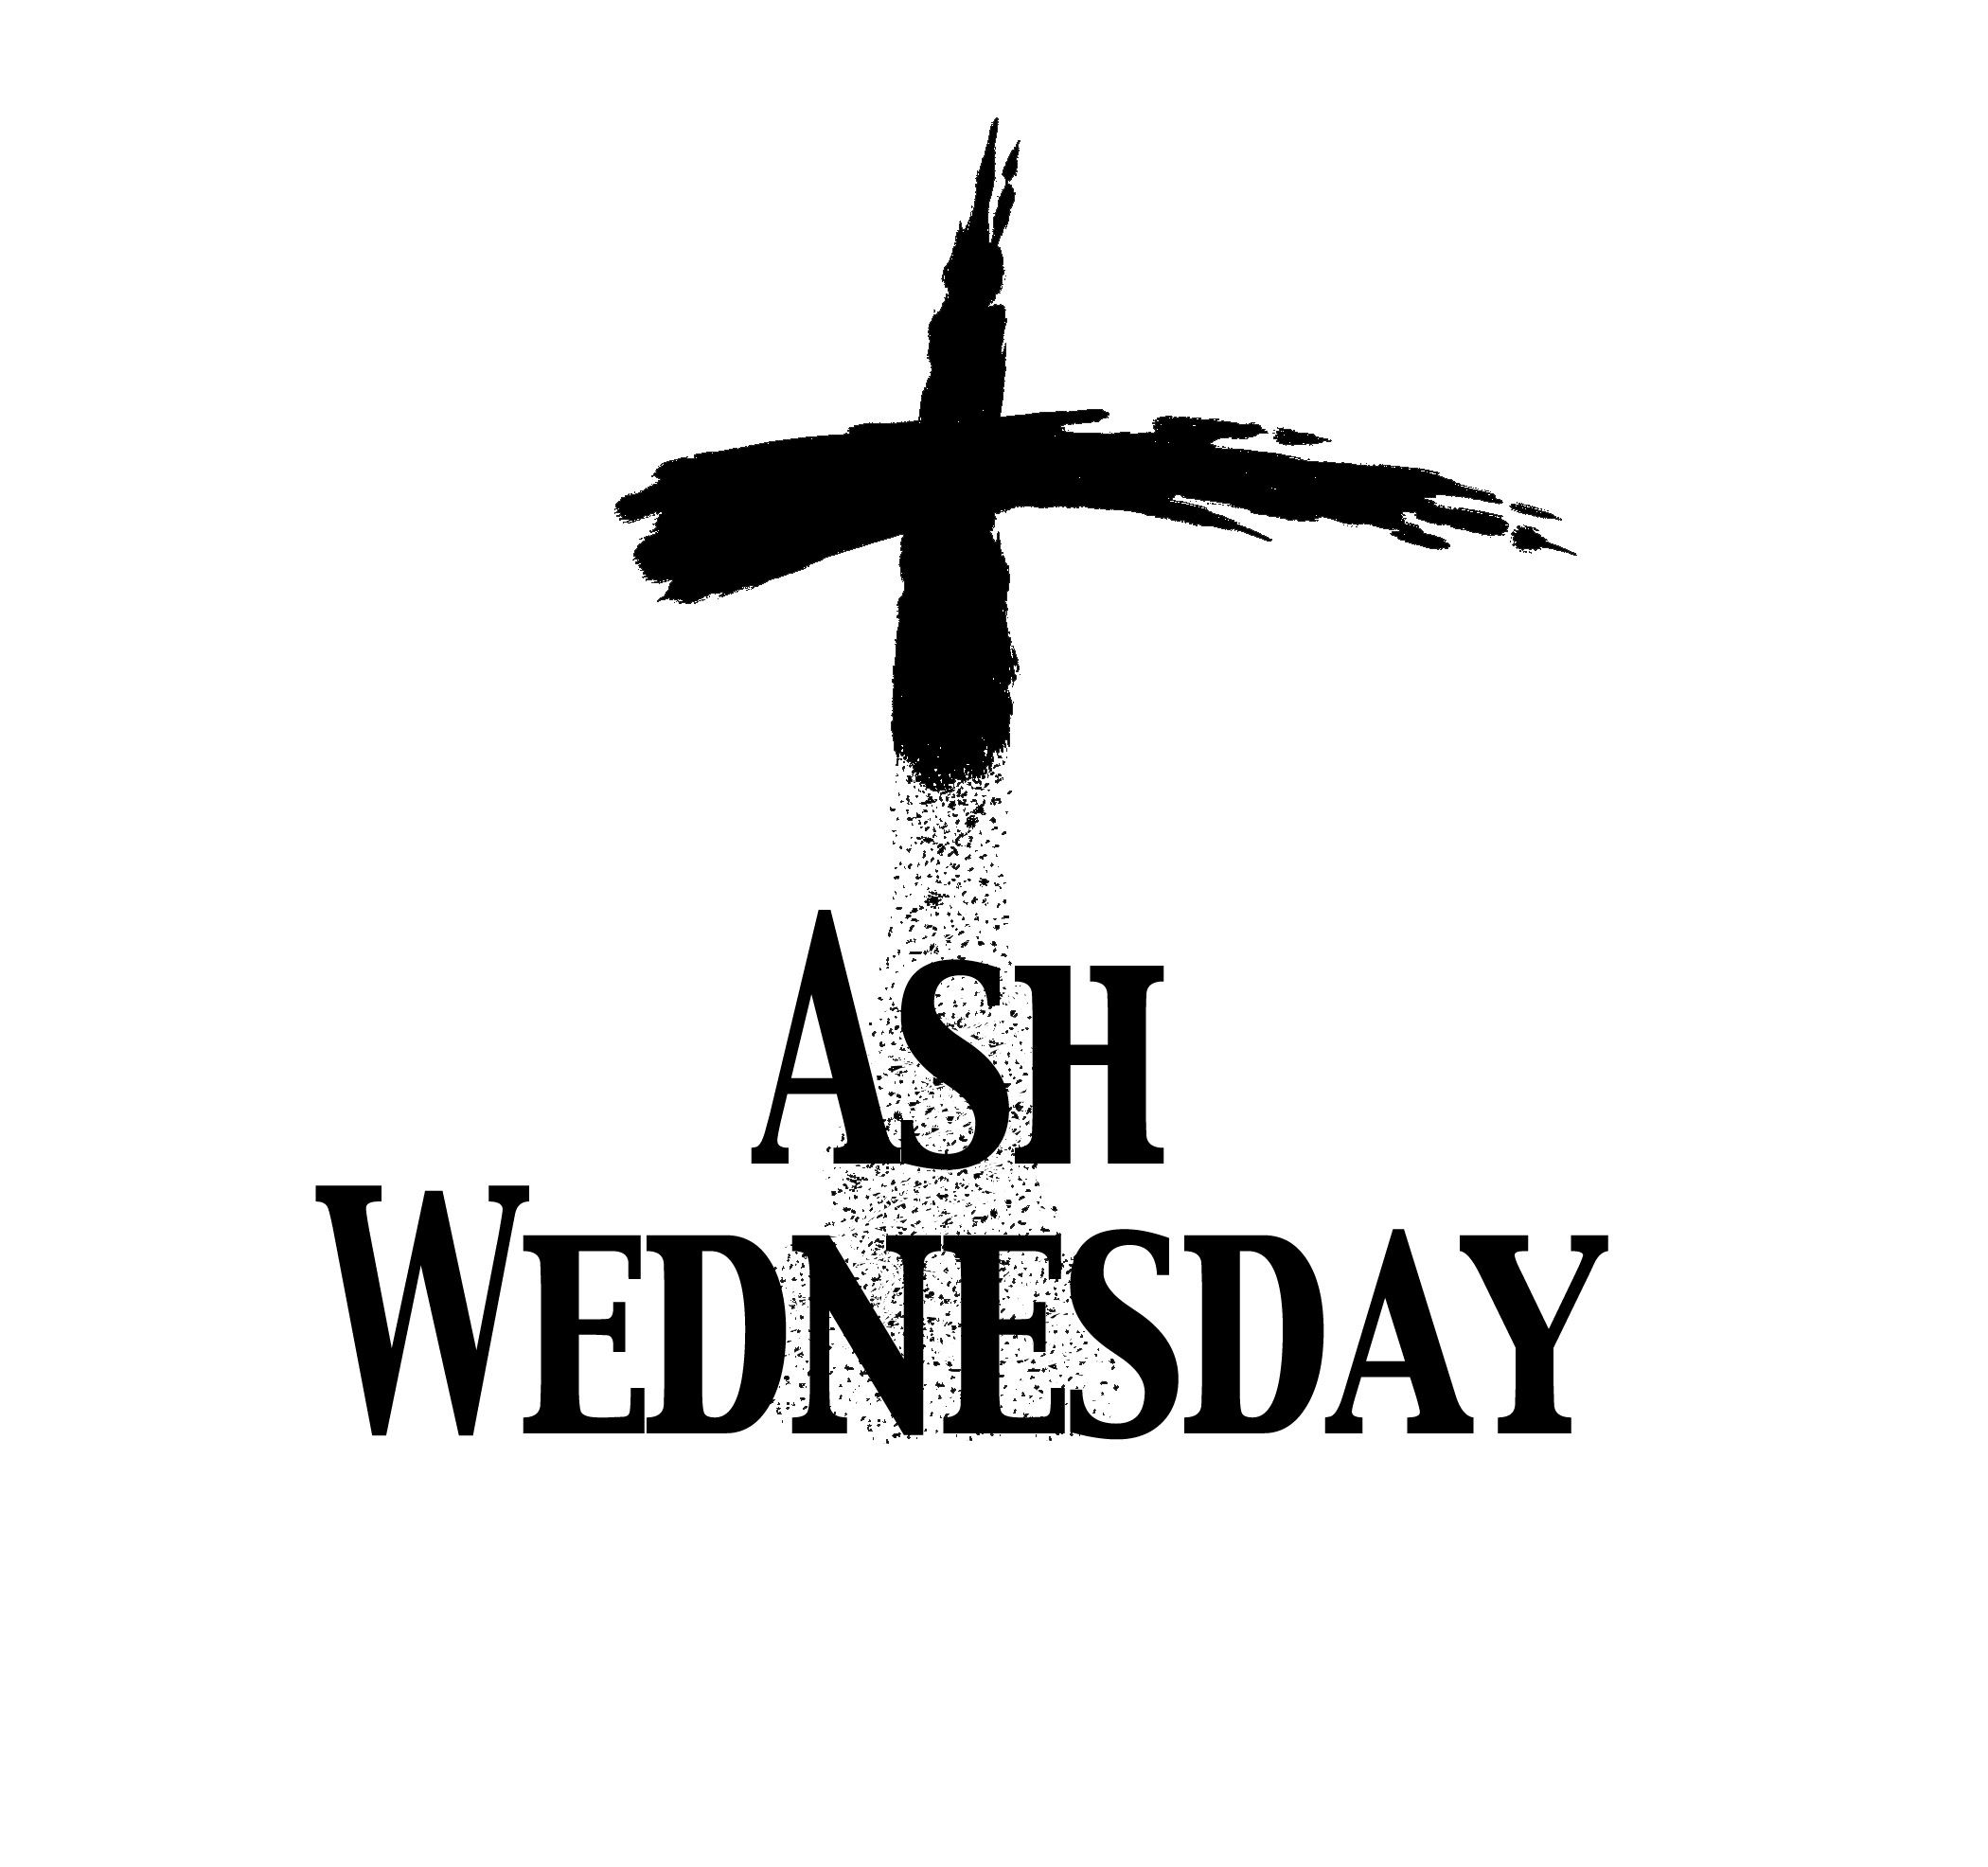 Ash Wednesday clipart-Ash Wednesday clipart-1